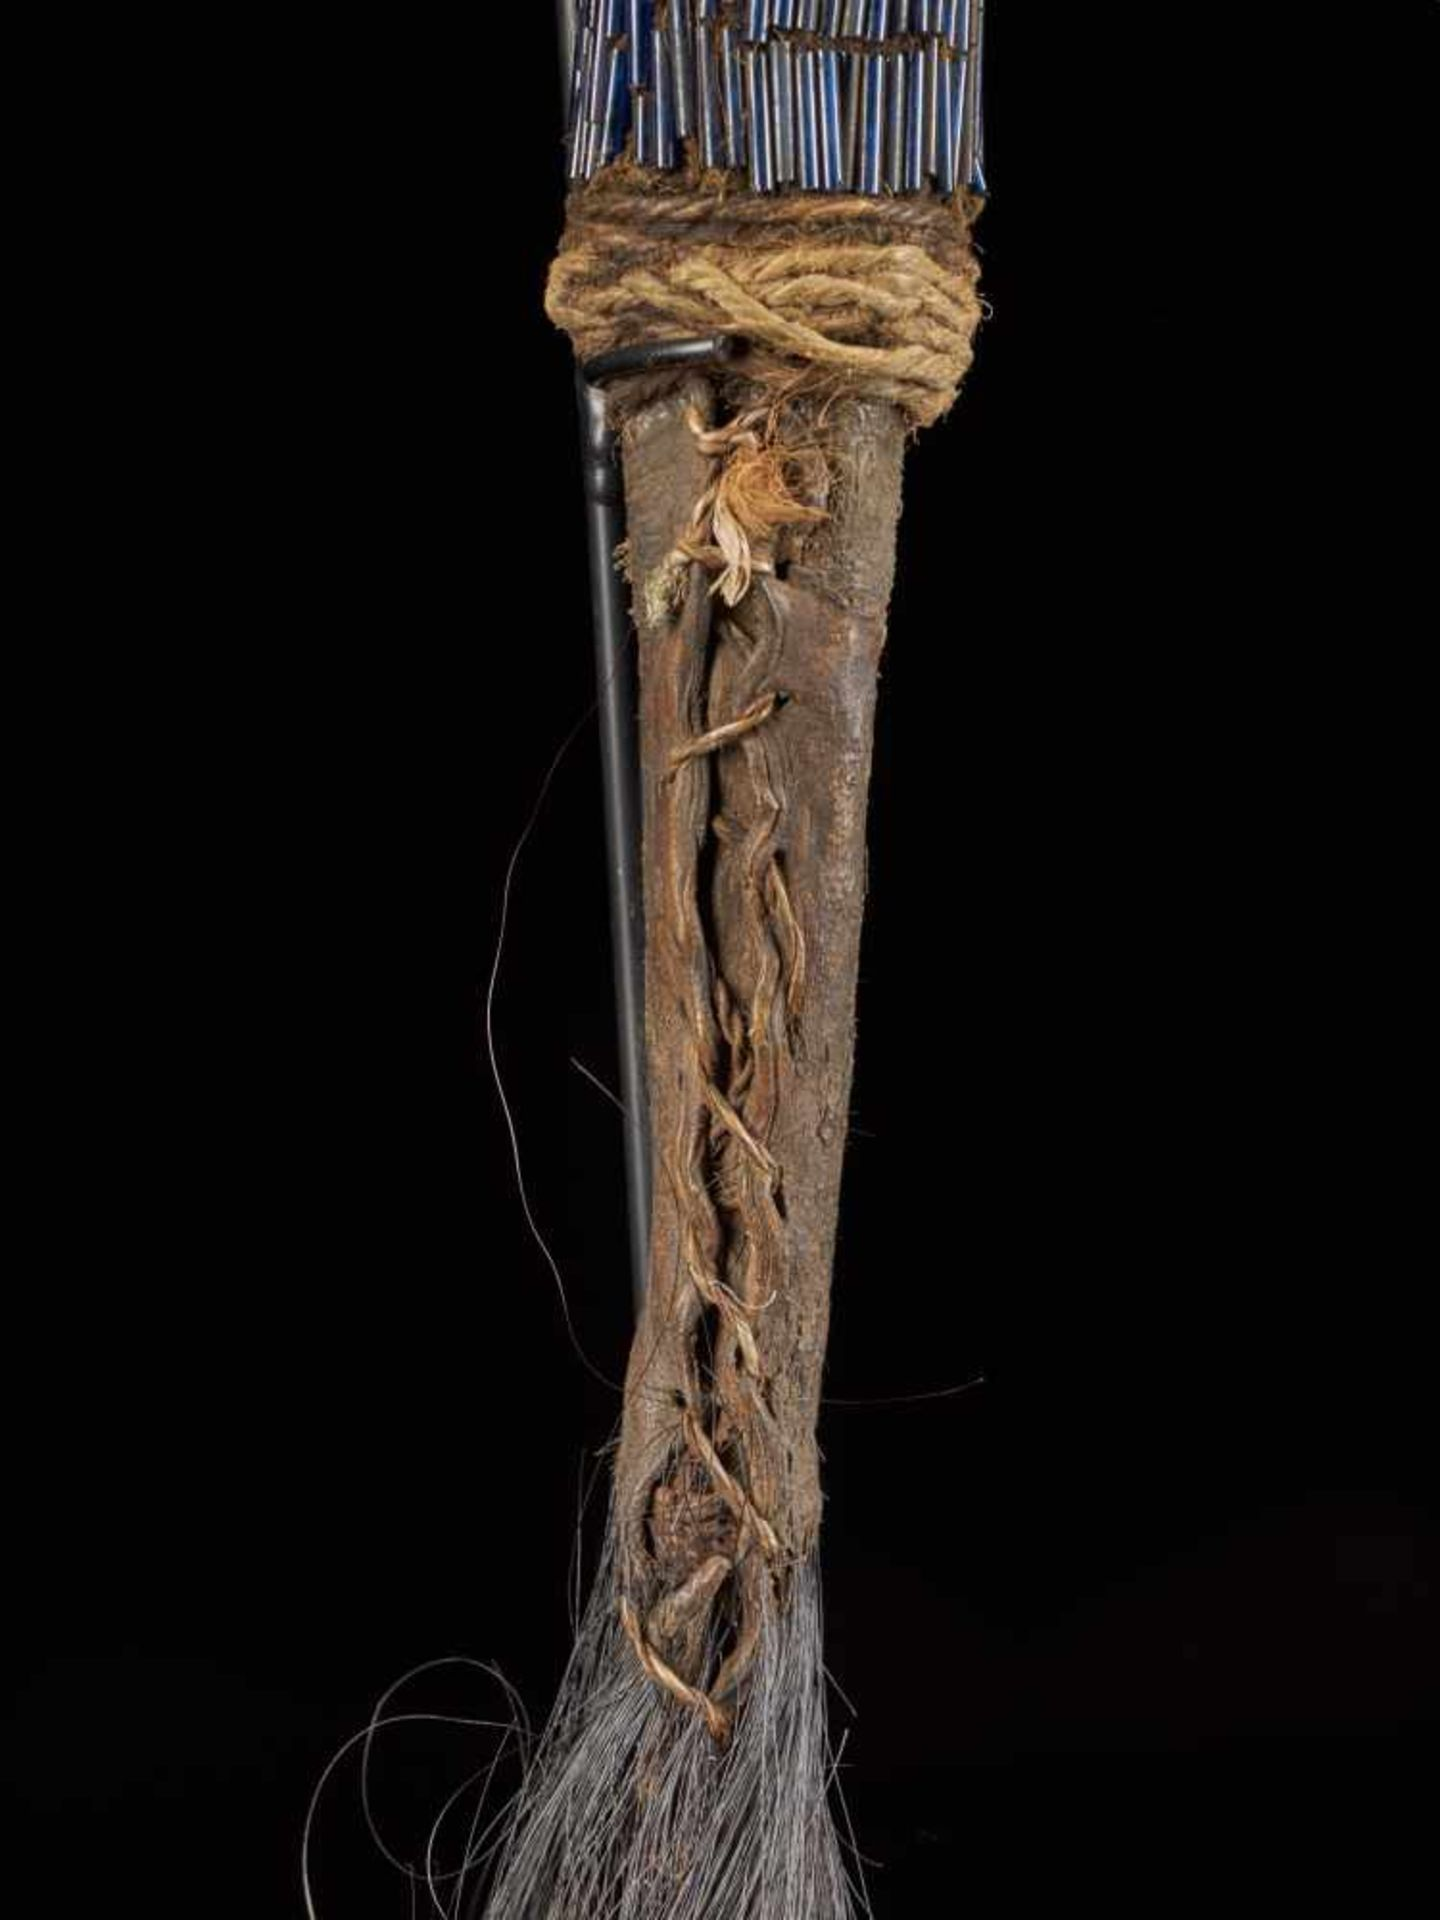 Beaded Flywhisk - Rooster - Tribal ArtThe Royal Fly Whisks (ethnic names: see leng koko or beuka) - Bild 6 aus 8